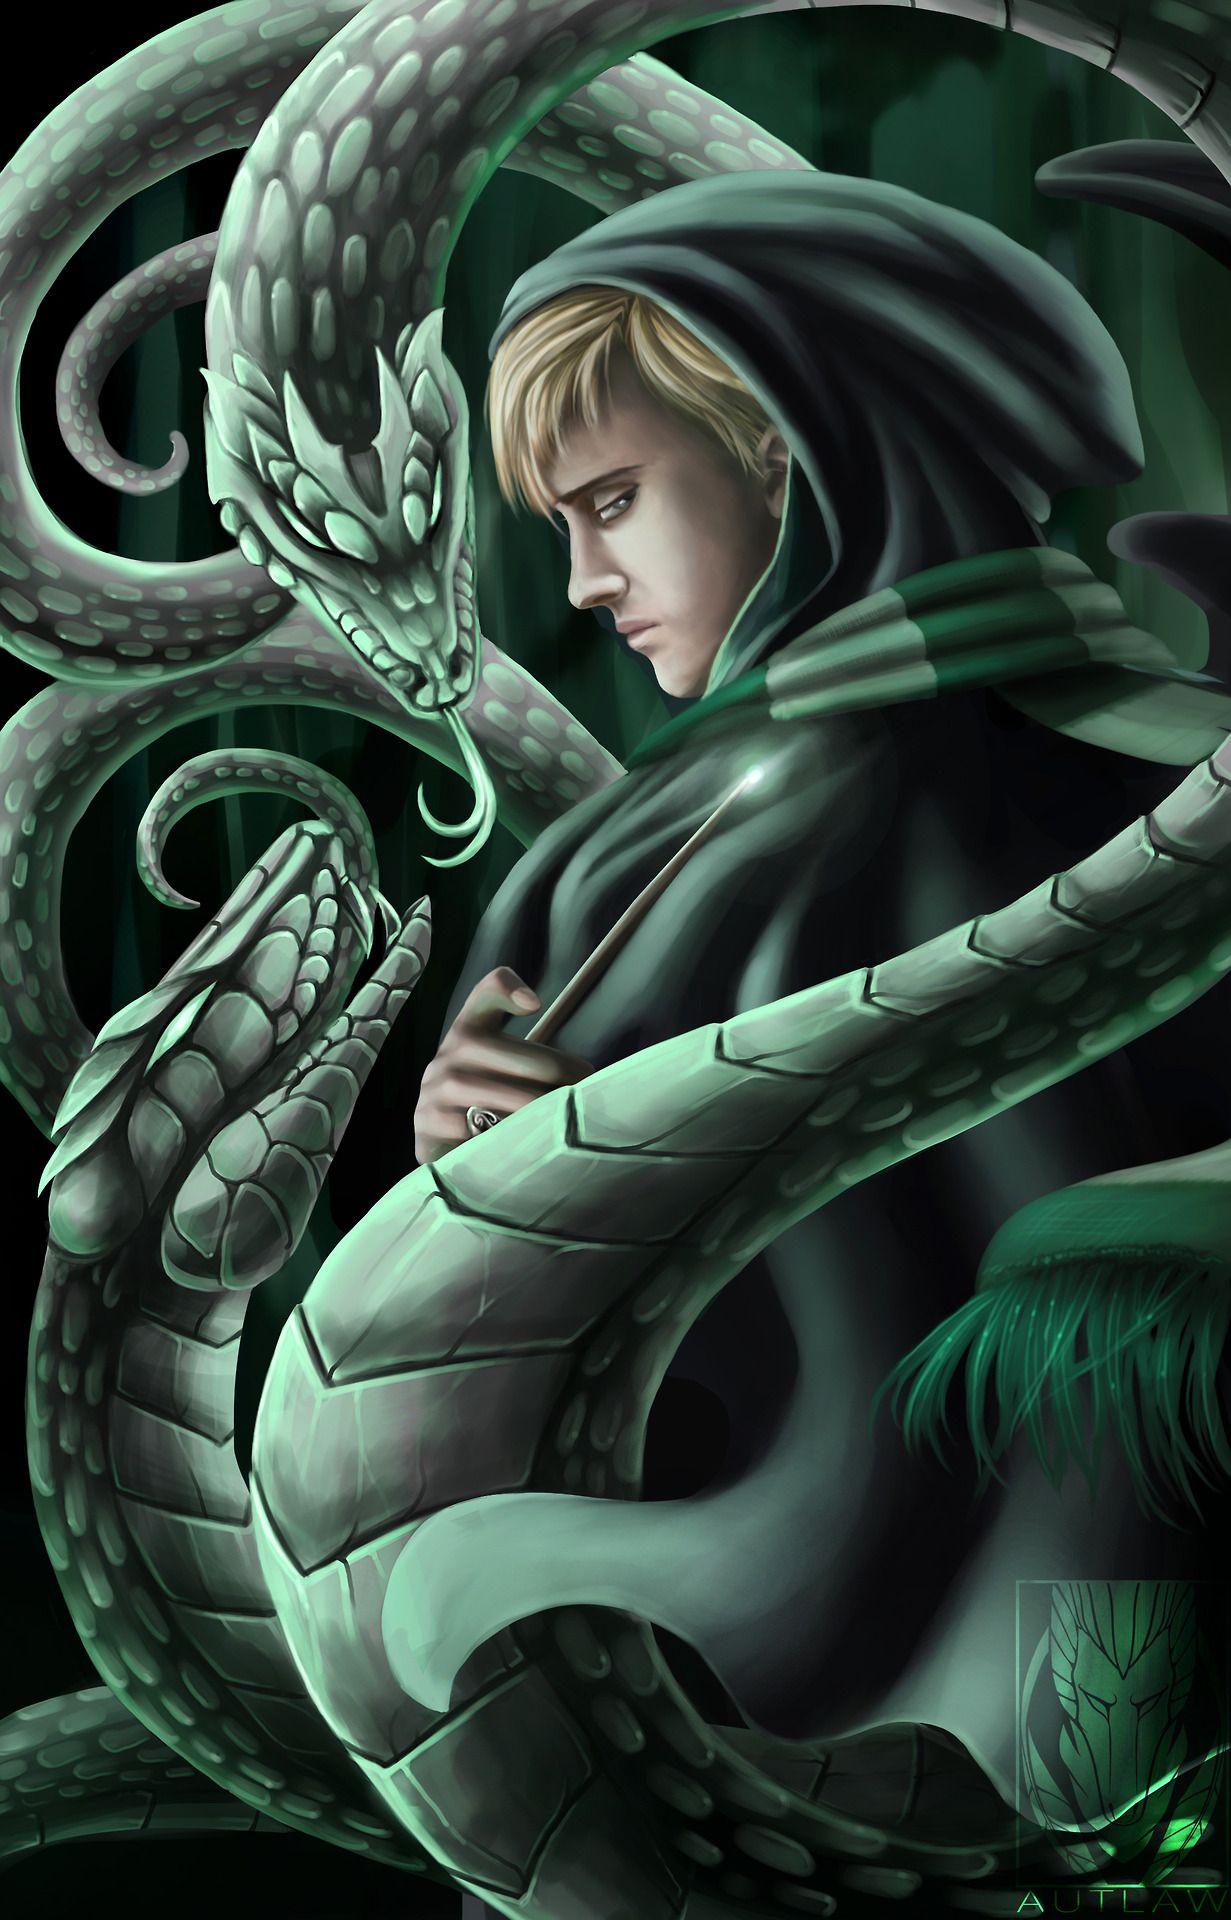 Slytherin Draco Malfoy By Autlaw As Well As A Misunderstood